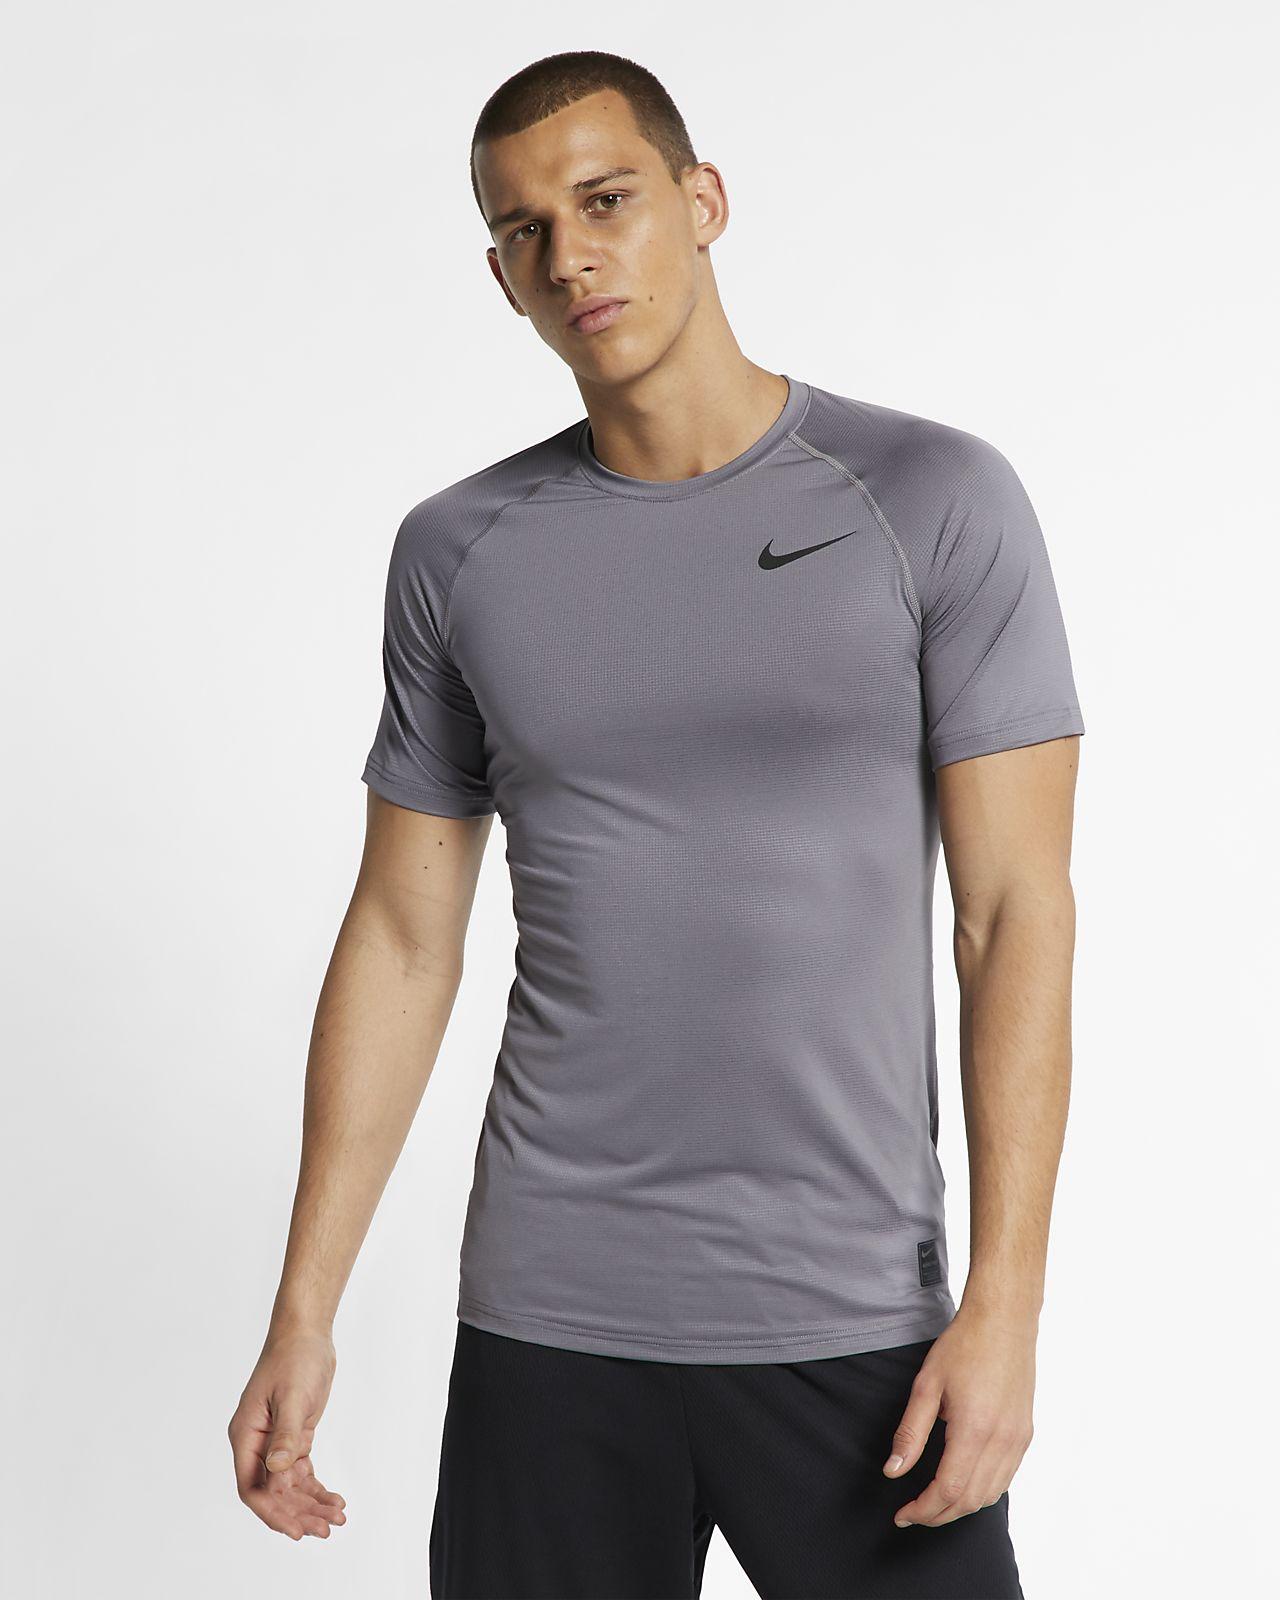 Nike Breathe Pro Men's Short-Sleeve Top